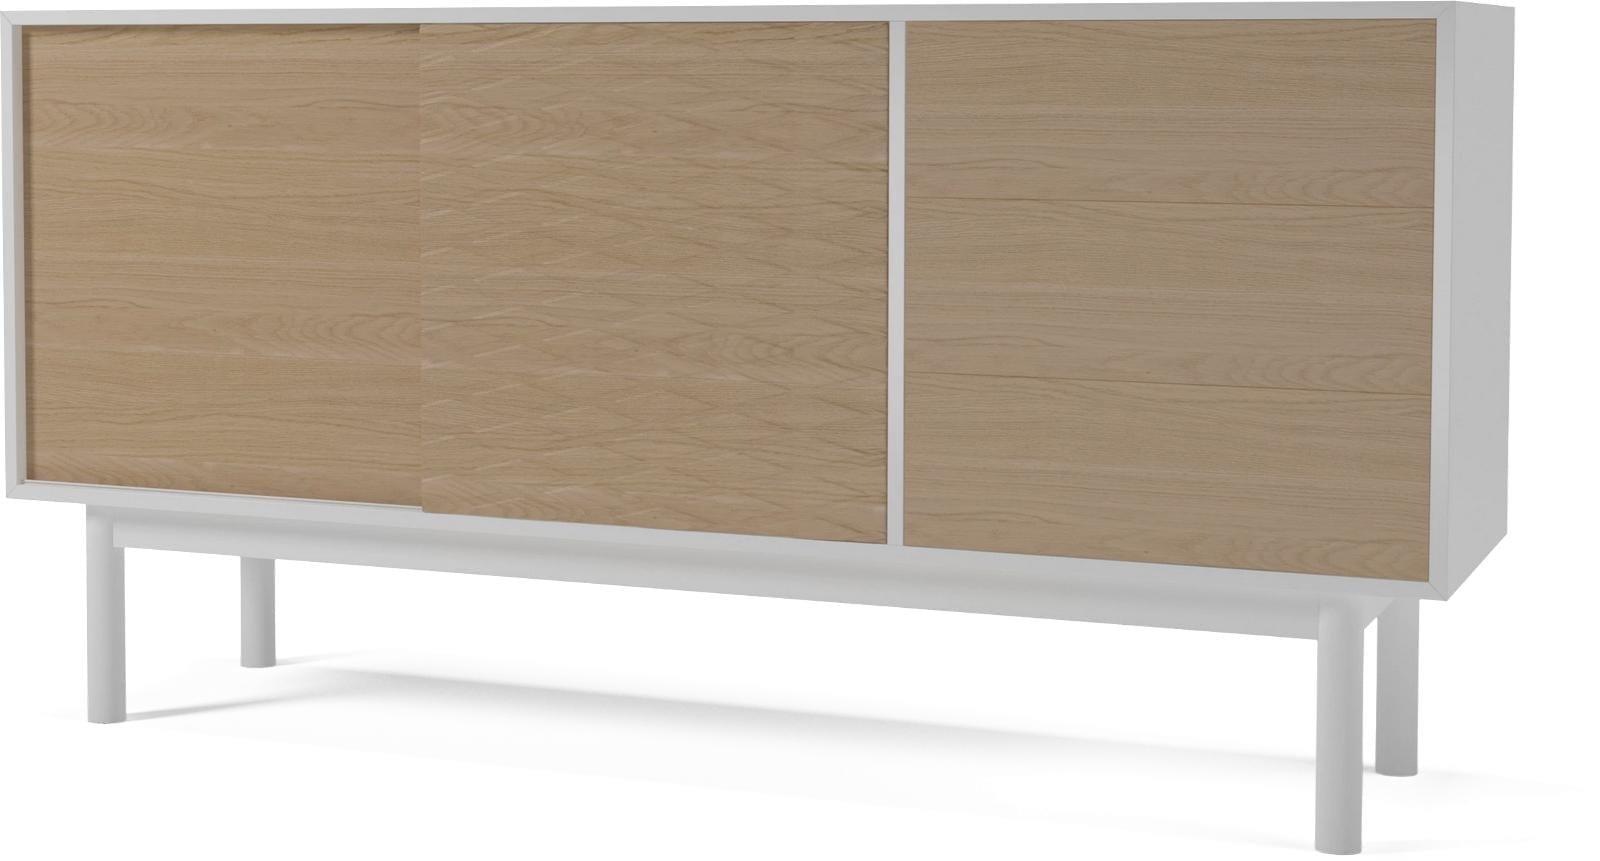 Case Sideboard Mdf Whitewhite Oak